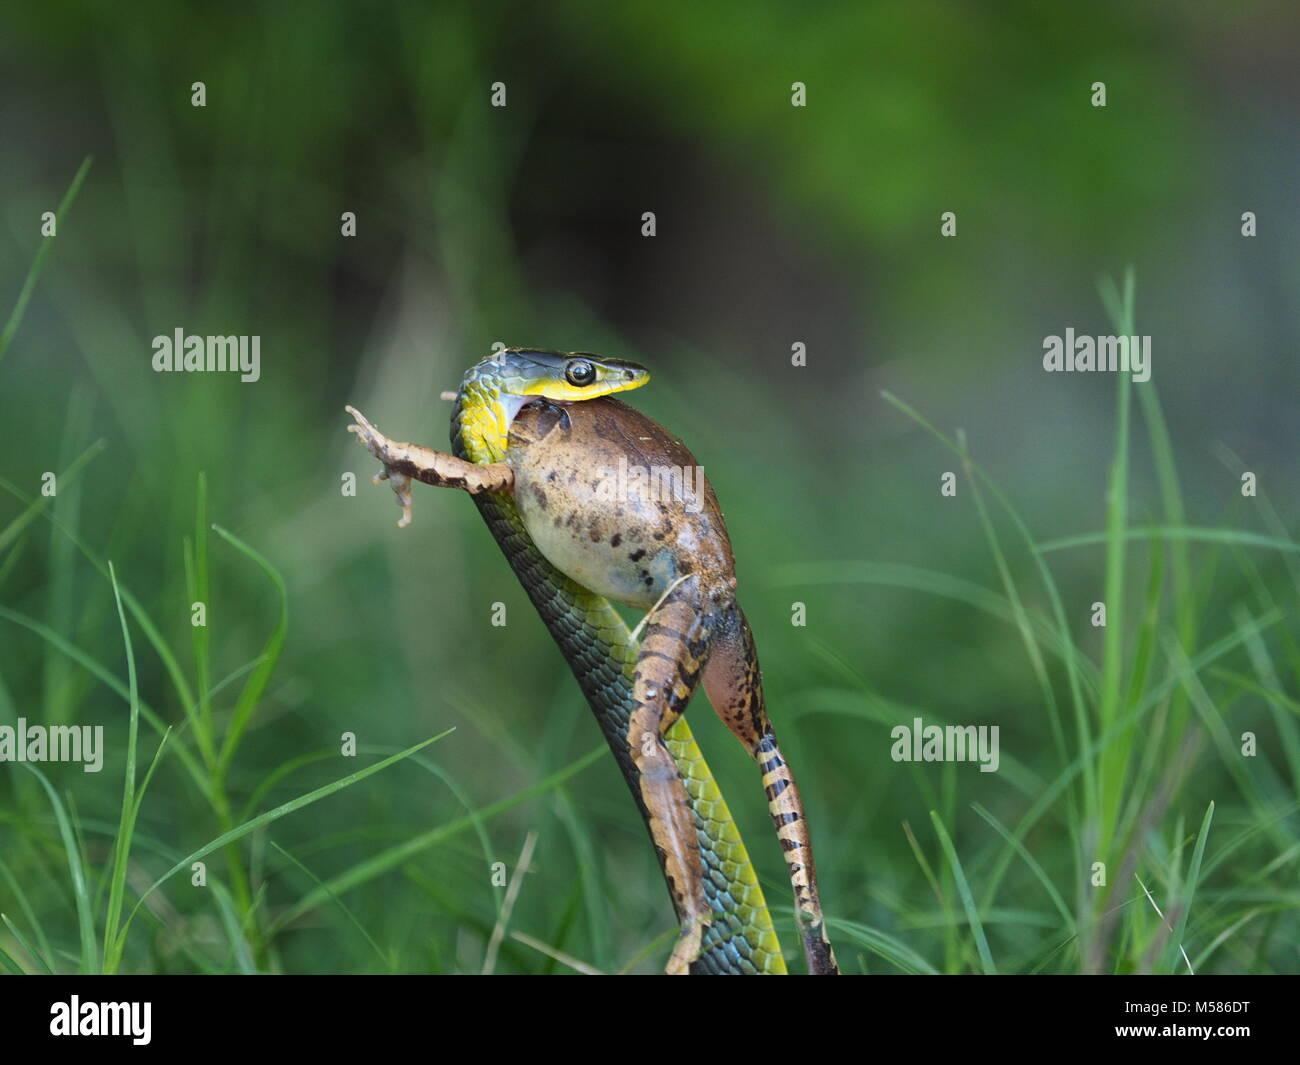 Tree snake eating frog - Stock Image